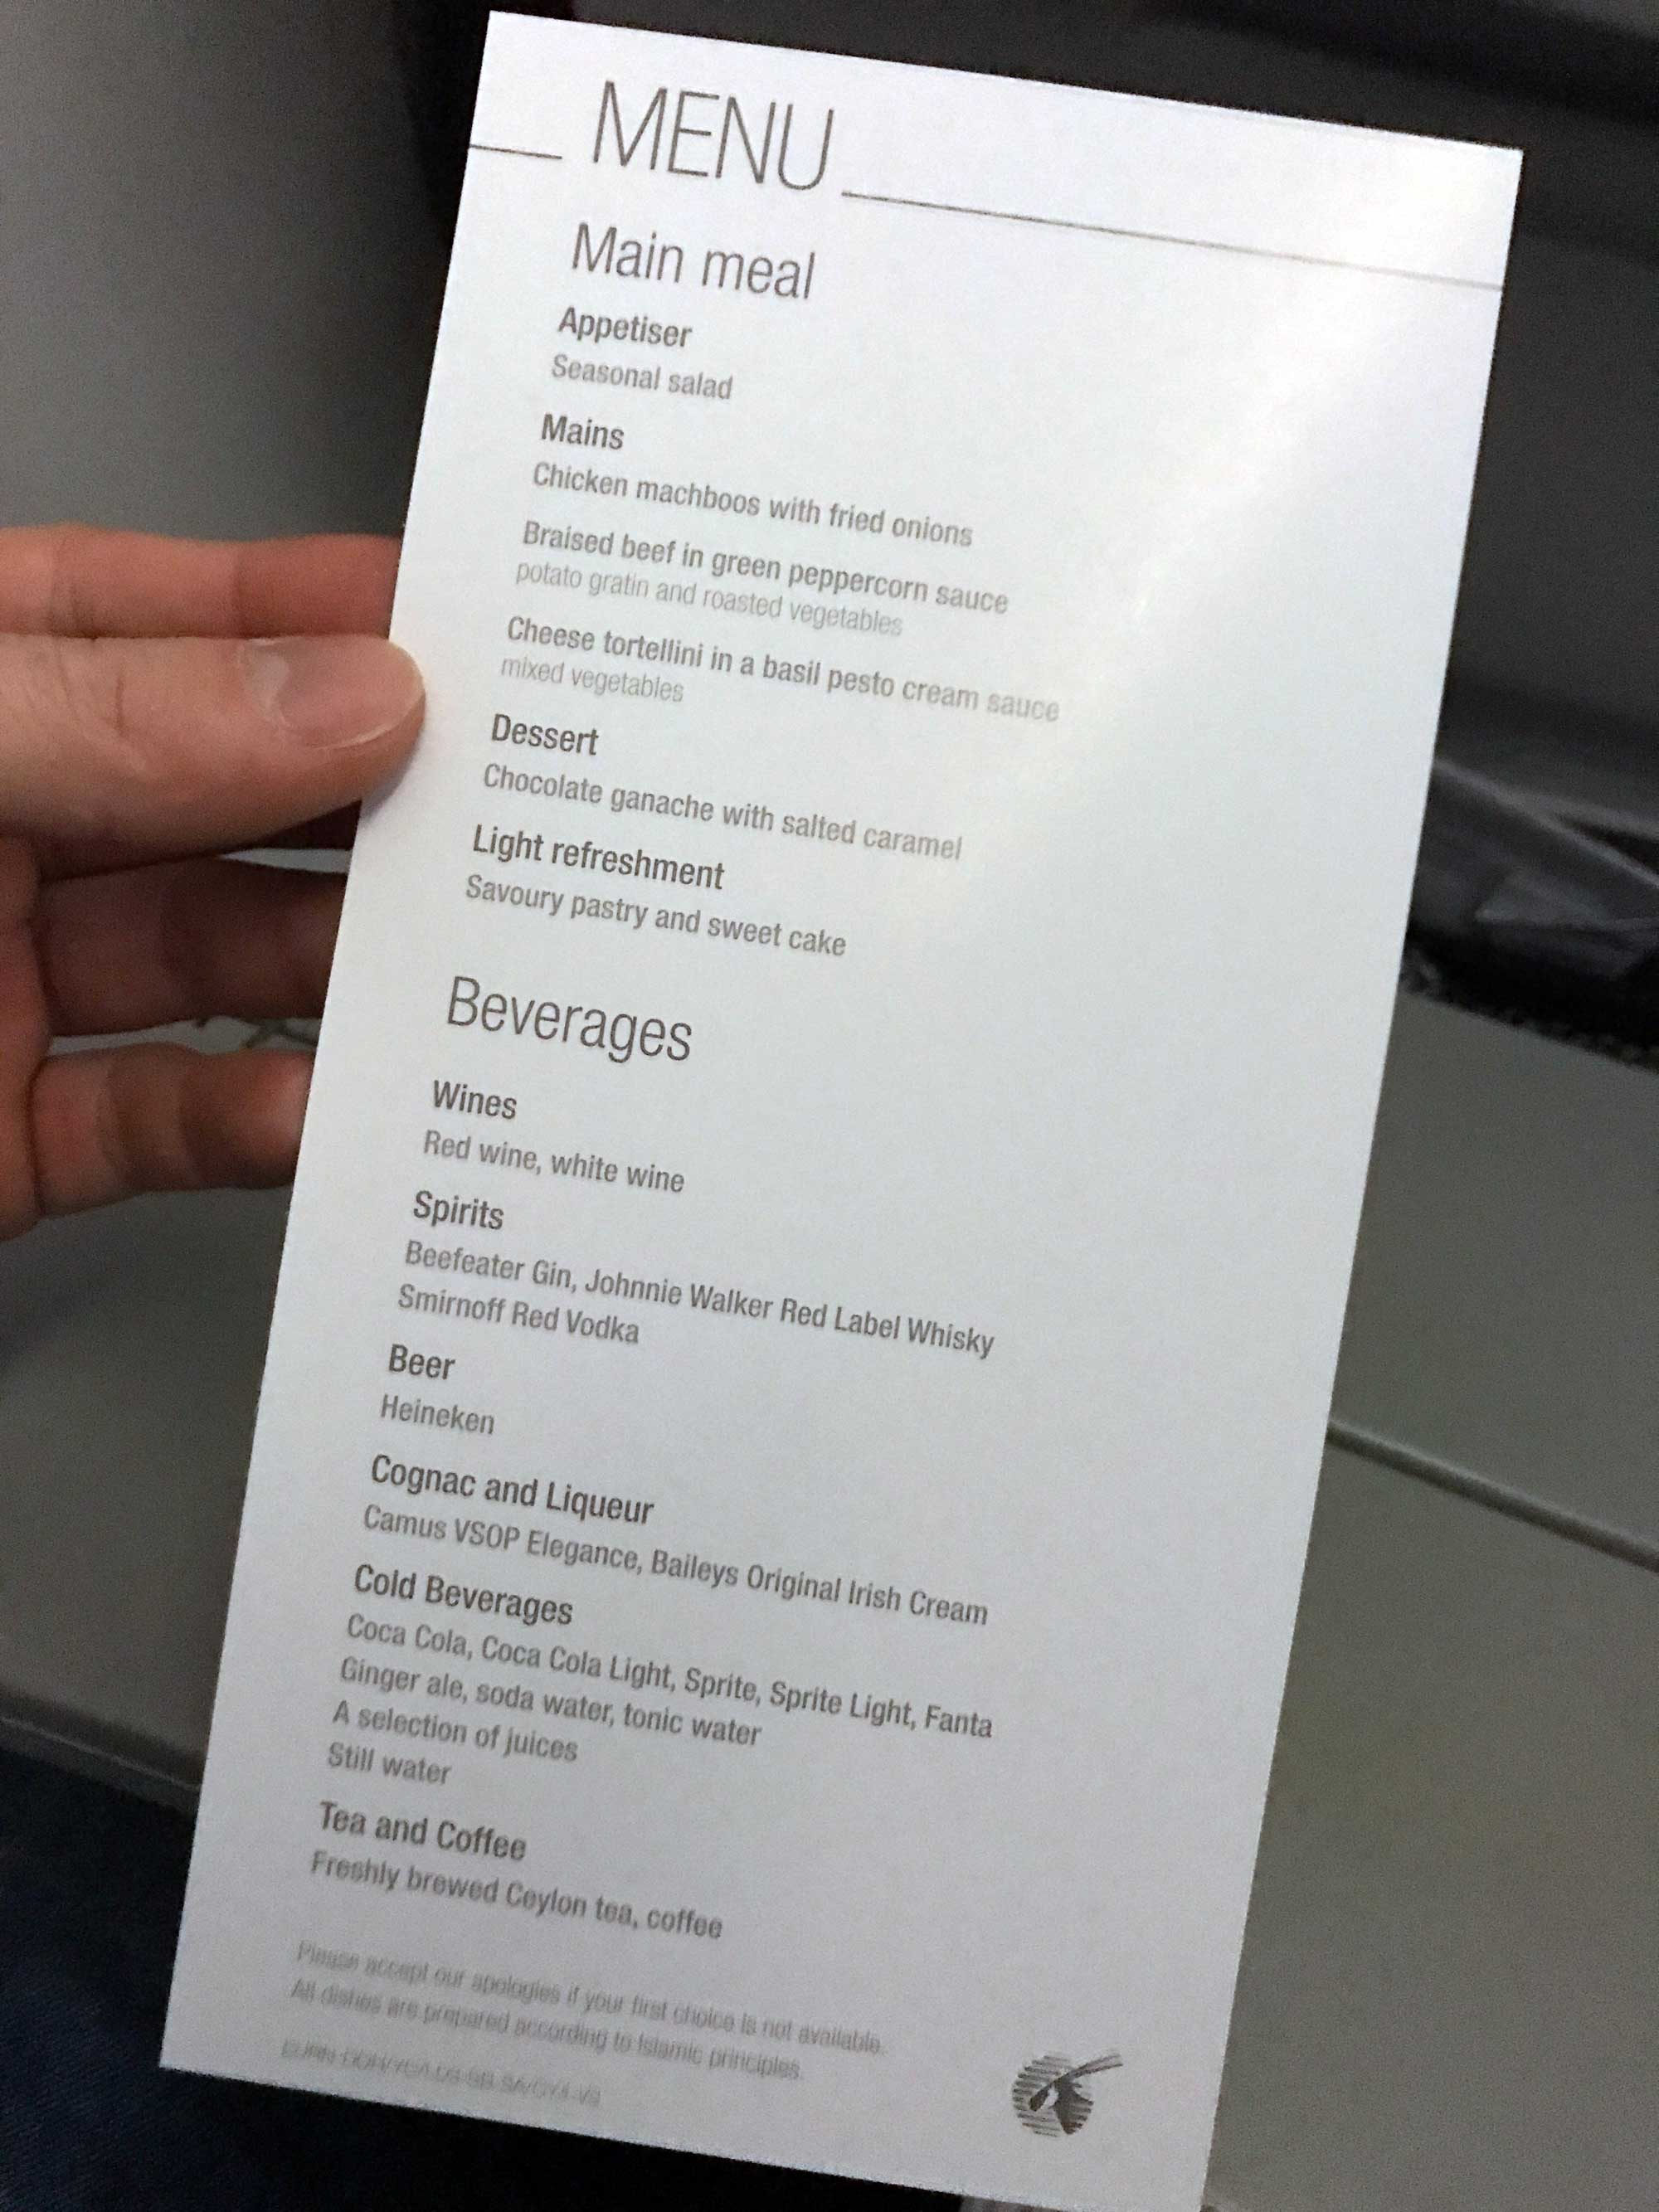 Qatar Airways menu Helsinki to DOHA - Blog - Screw Them All